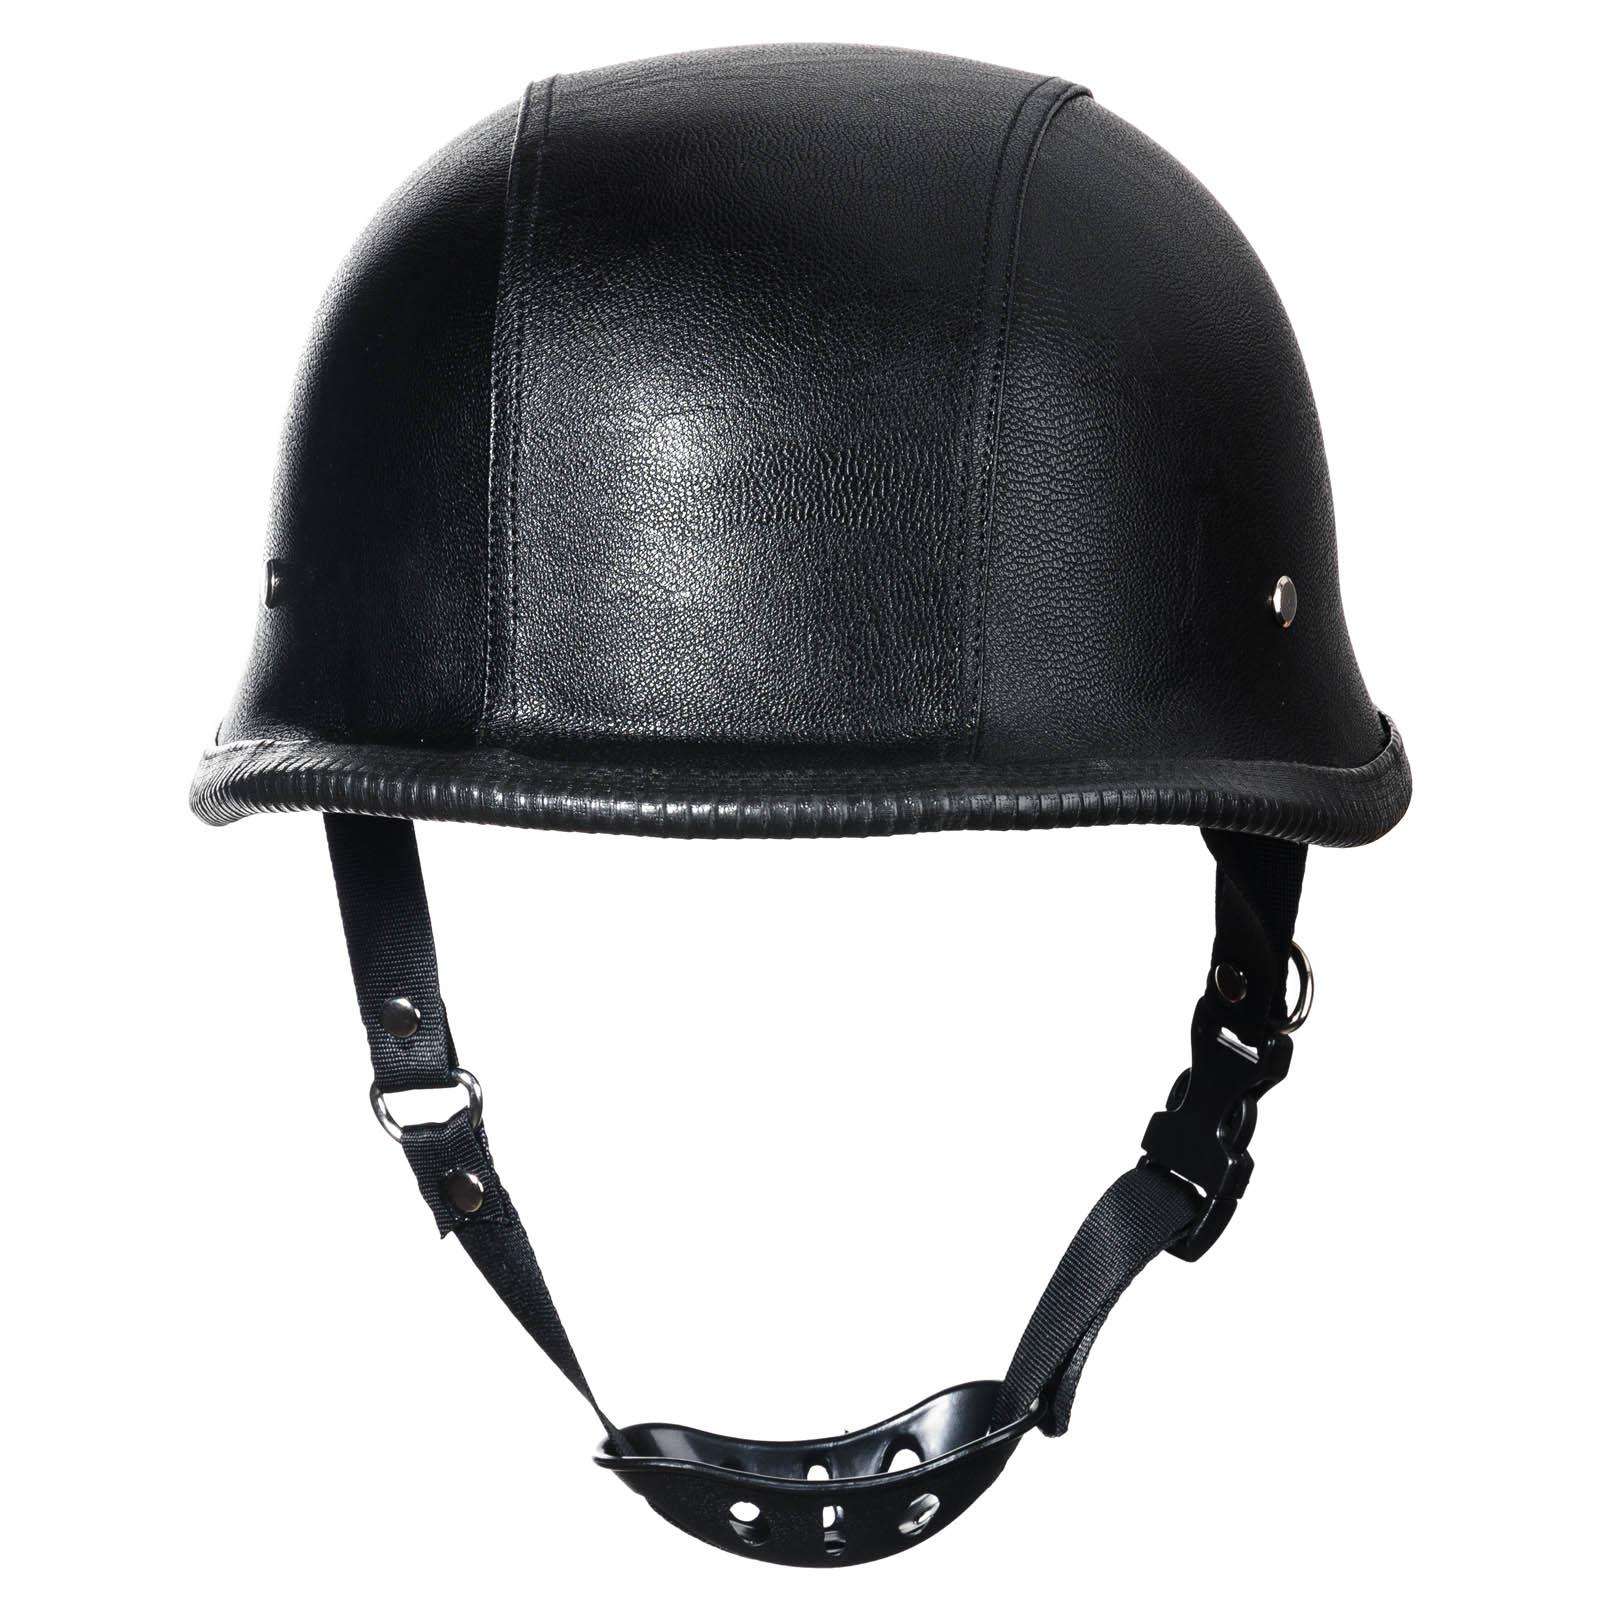 2016 New WWII German Style Dot Motorcycle Helmet Black Vintage Half Face Motorcycle Helmet For Chopper Motorcycle Size L